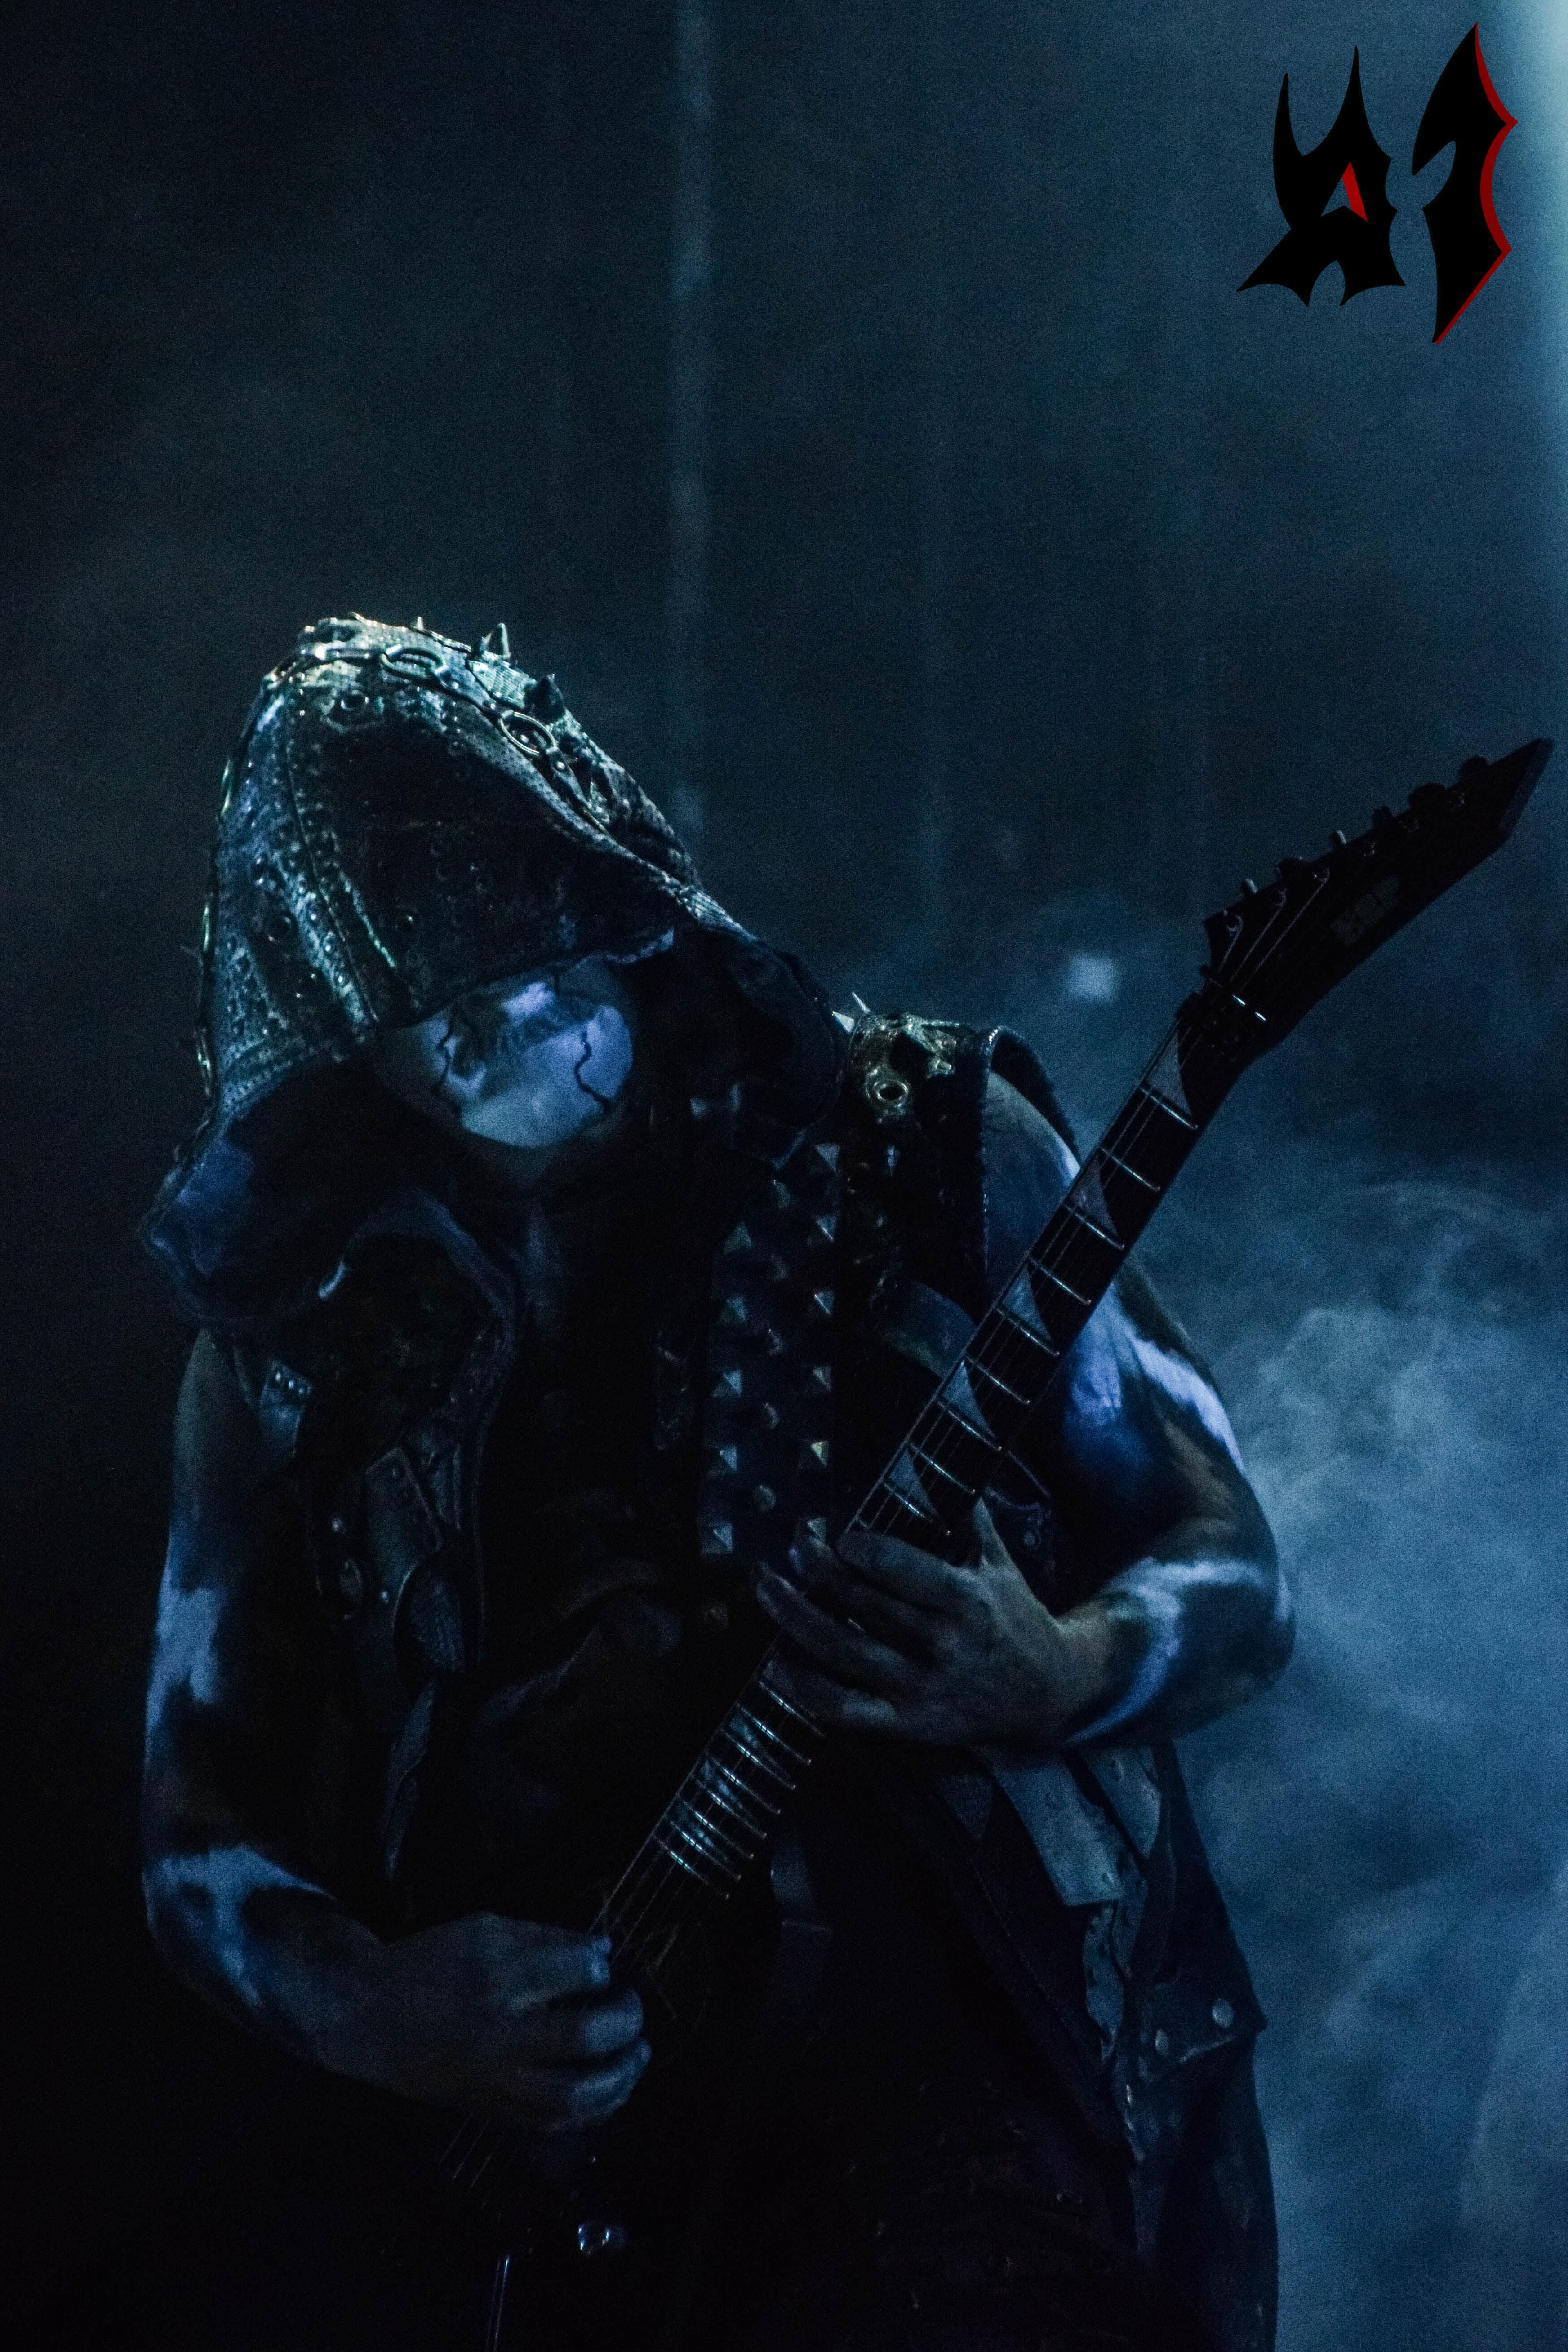 Hellfest - Jour 2 - Dimmu Borgir 14